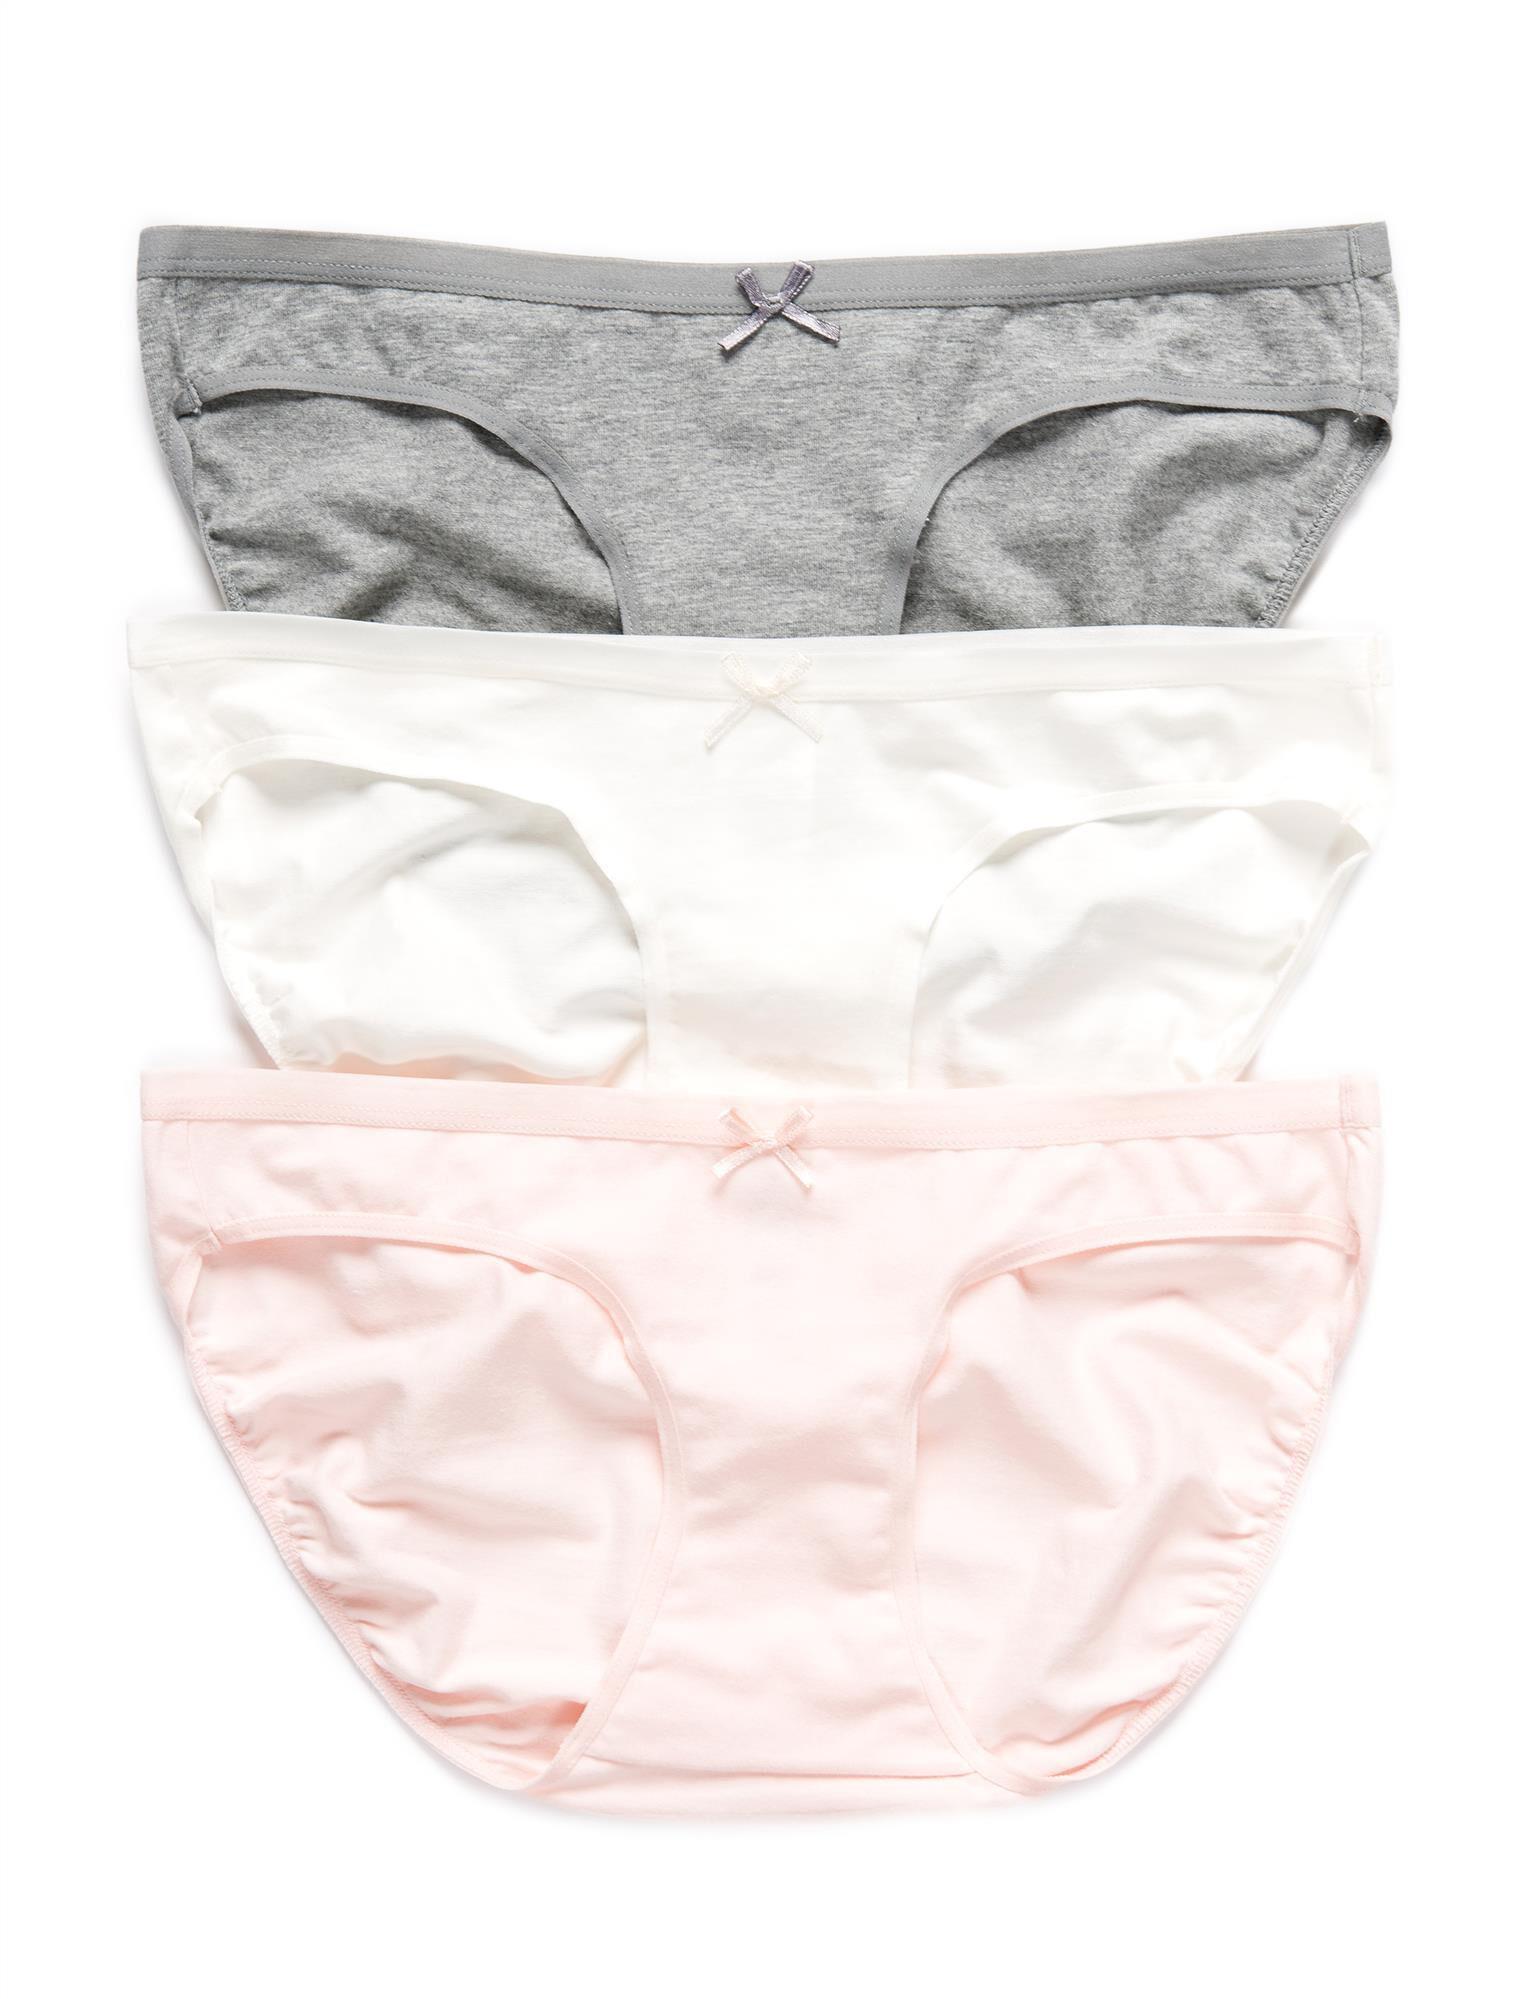 Maternity Bikini Panties (3 Pack)- Grey/White/Pink